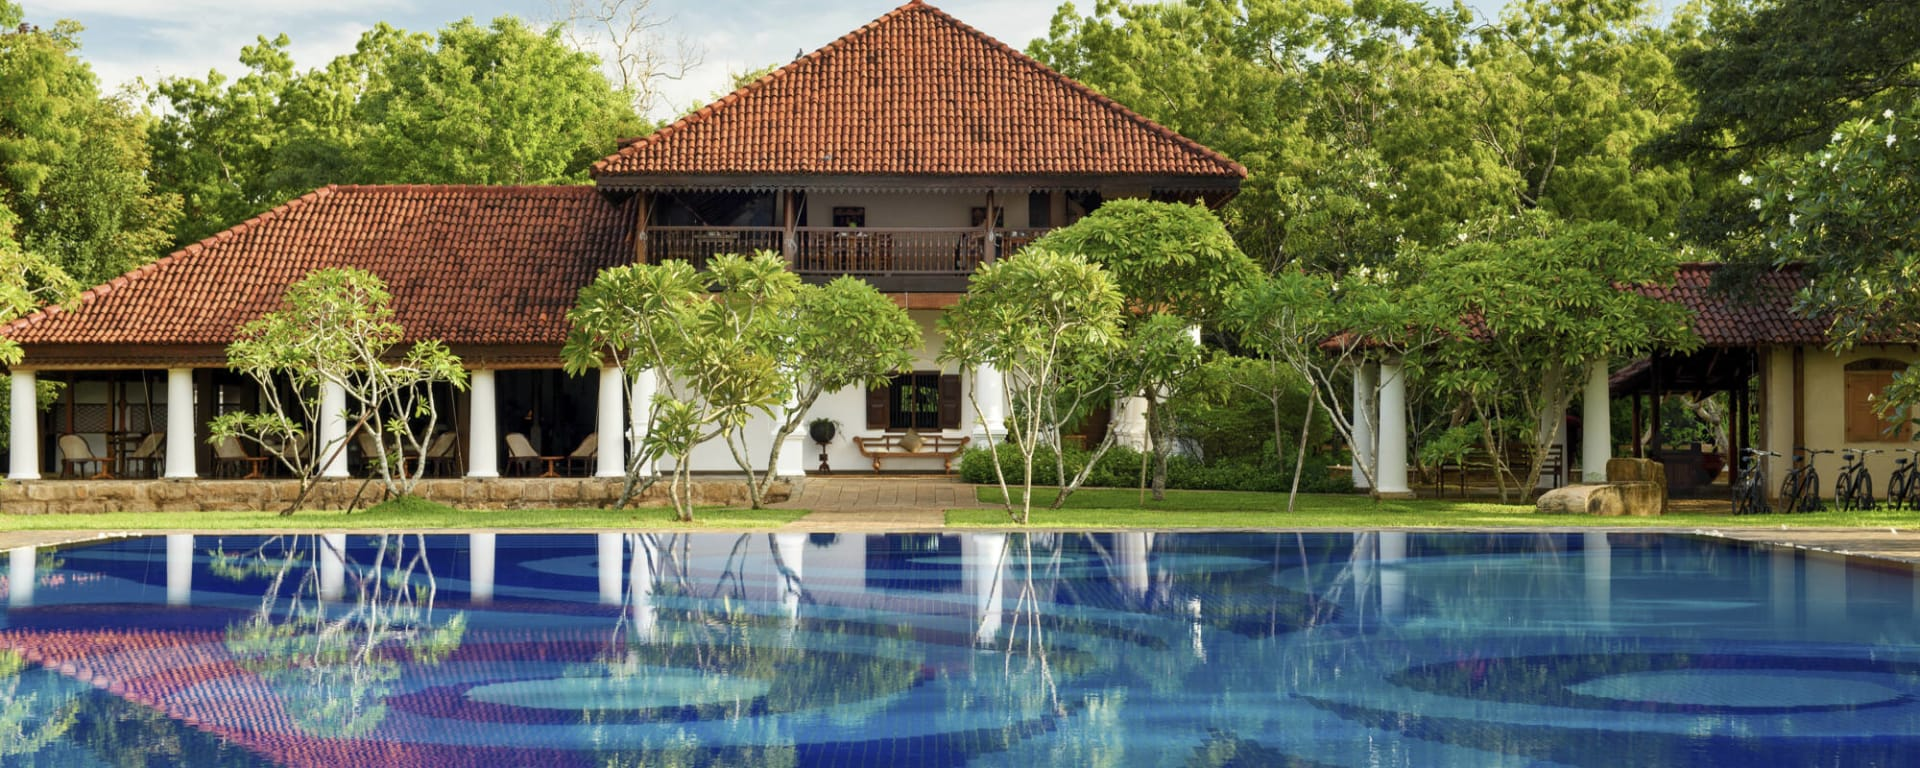 Uga Ulagalla in Anuradhapura: Sri Lanka Ulagalla Anuradhapura Pool